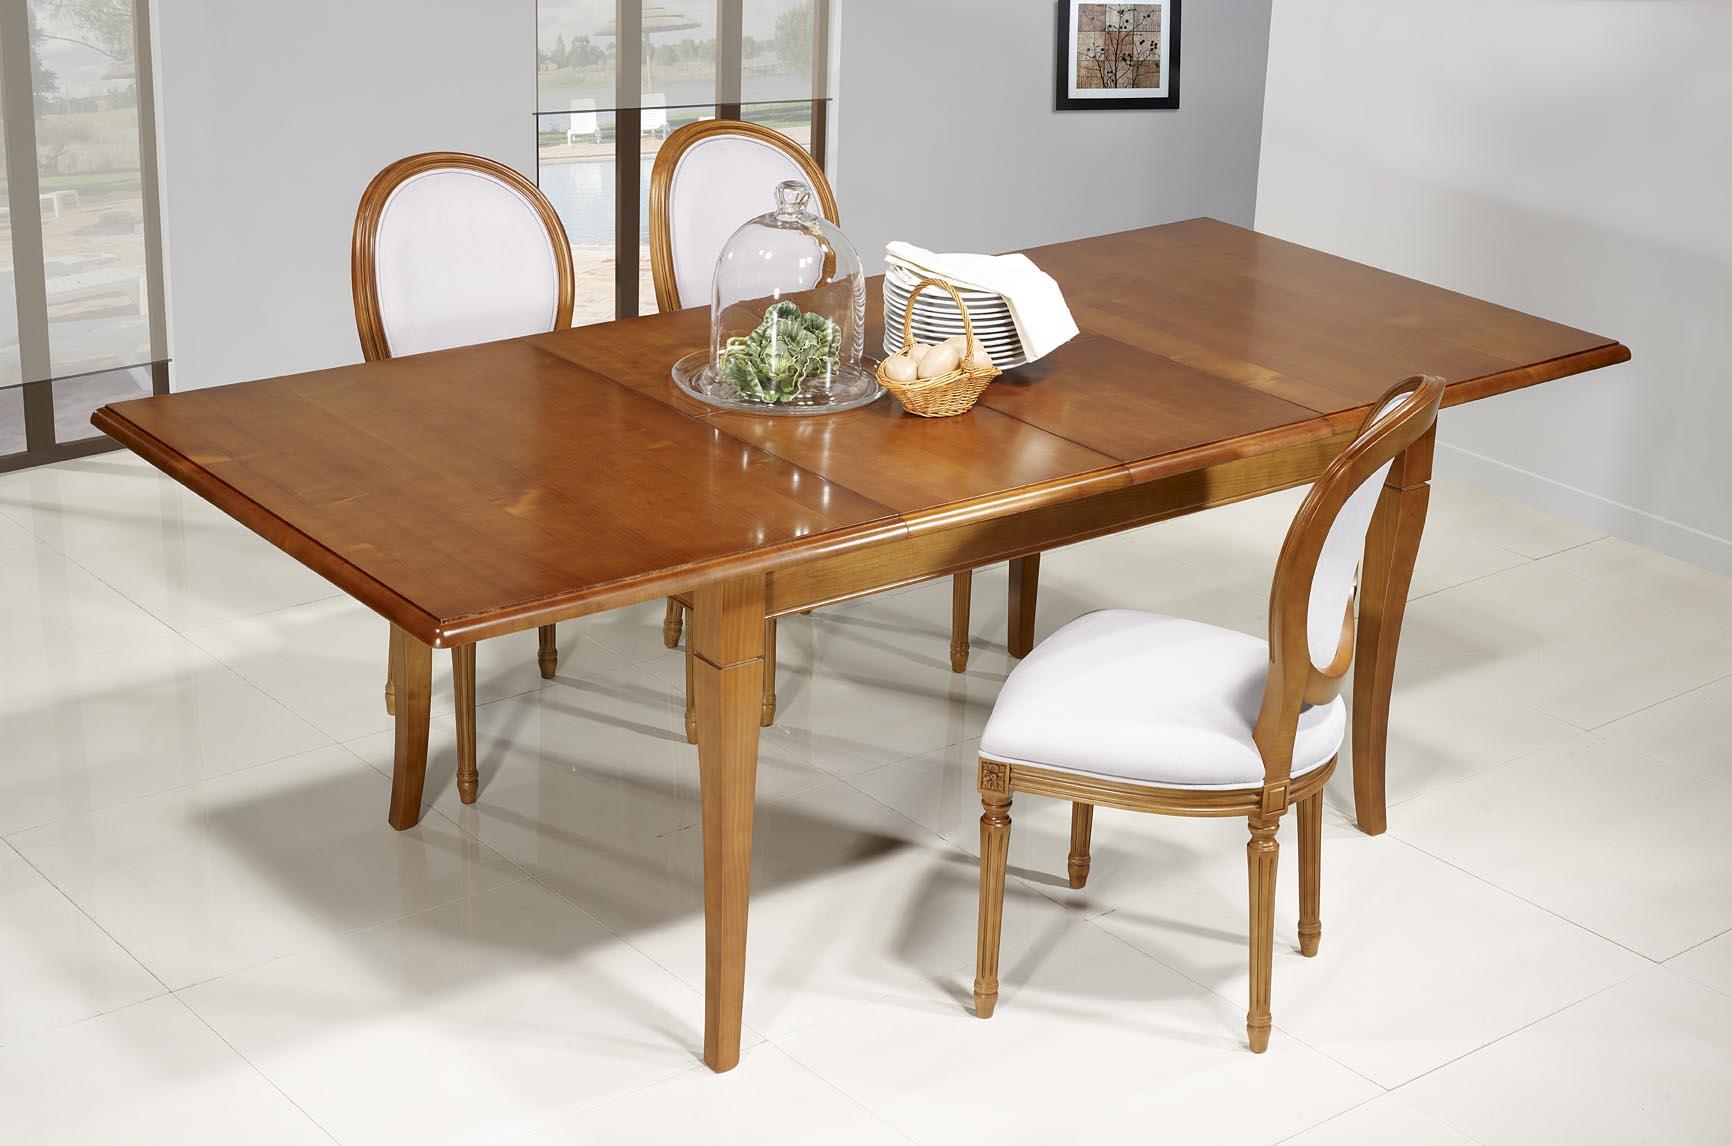 Table de repas Emeline en Merisier Massif de style Louis Philippe ...